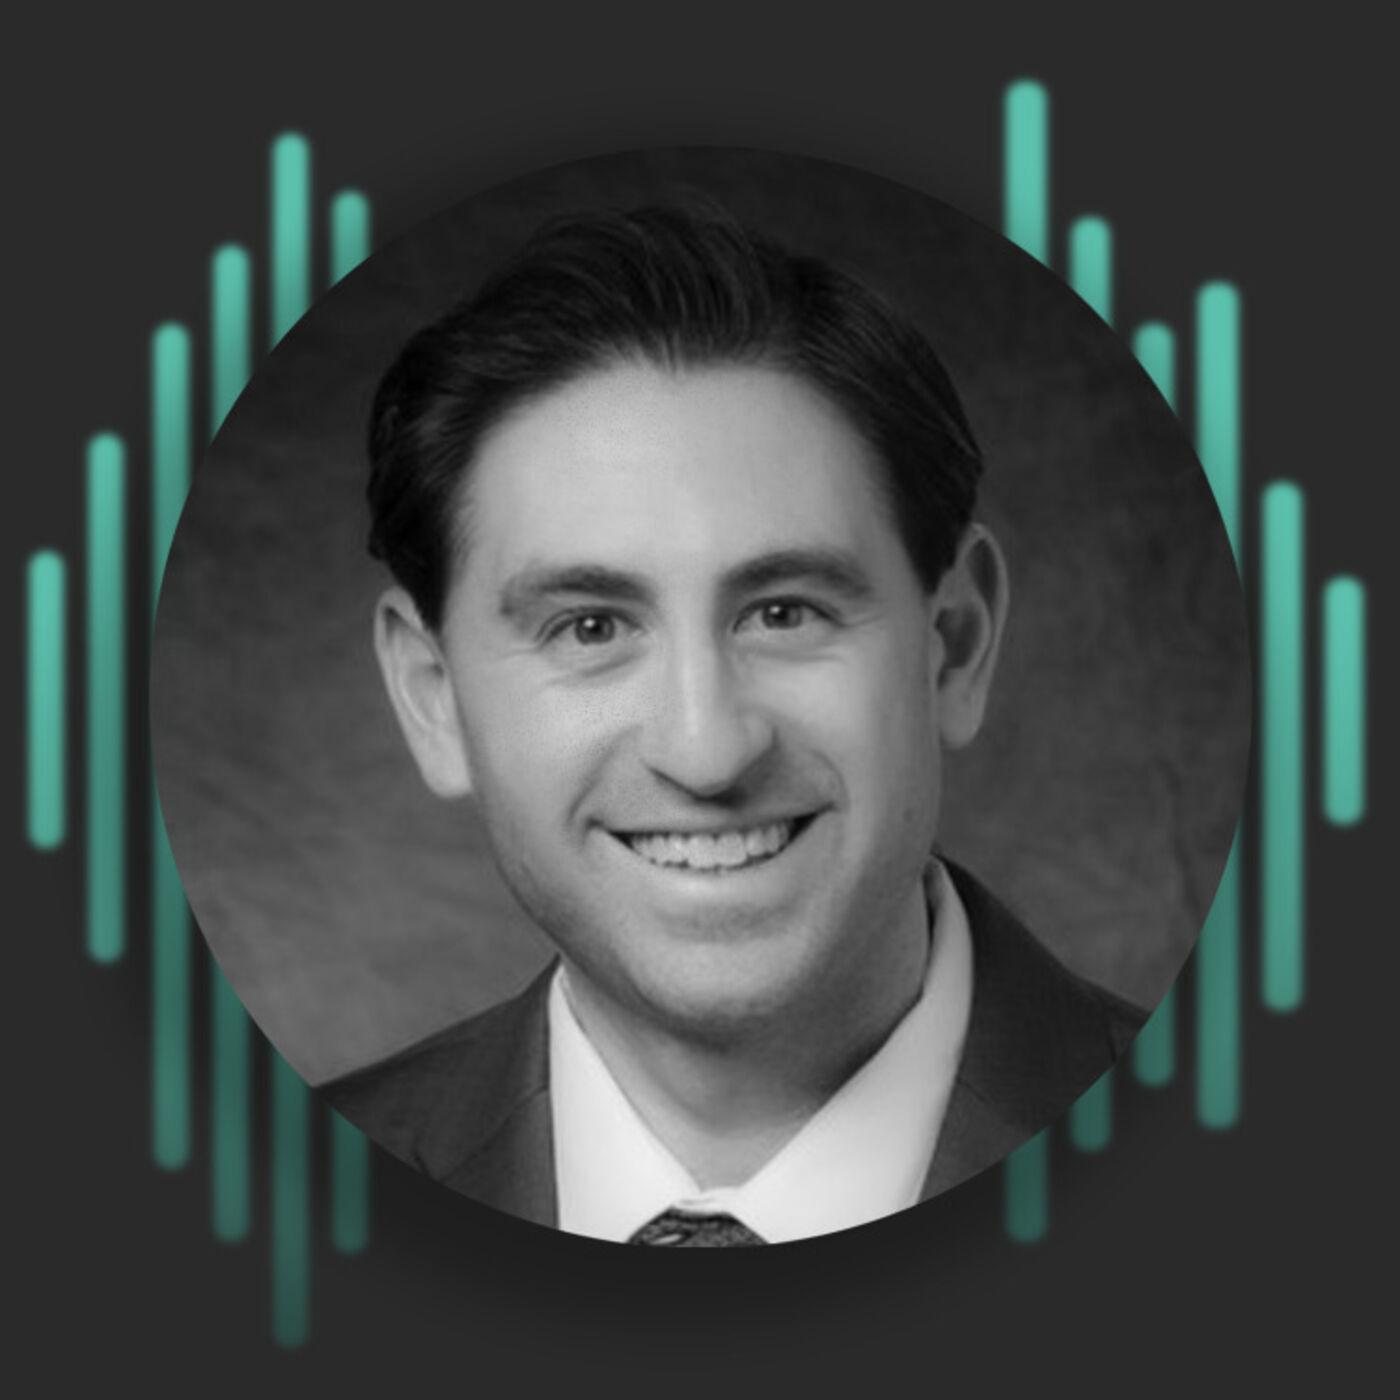 Episode 7: Matthew Rosenzweig D.O. Surgical Transplant Fellow